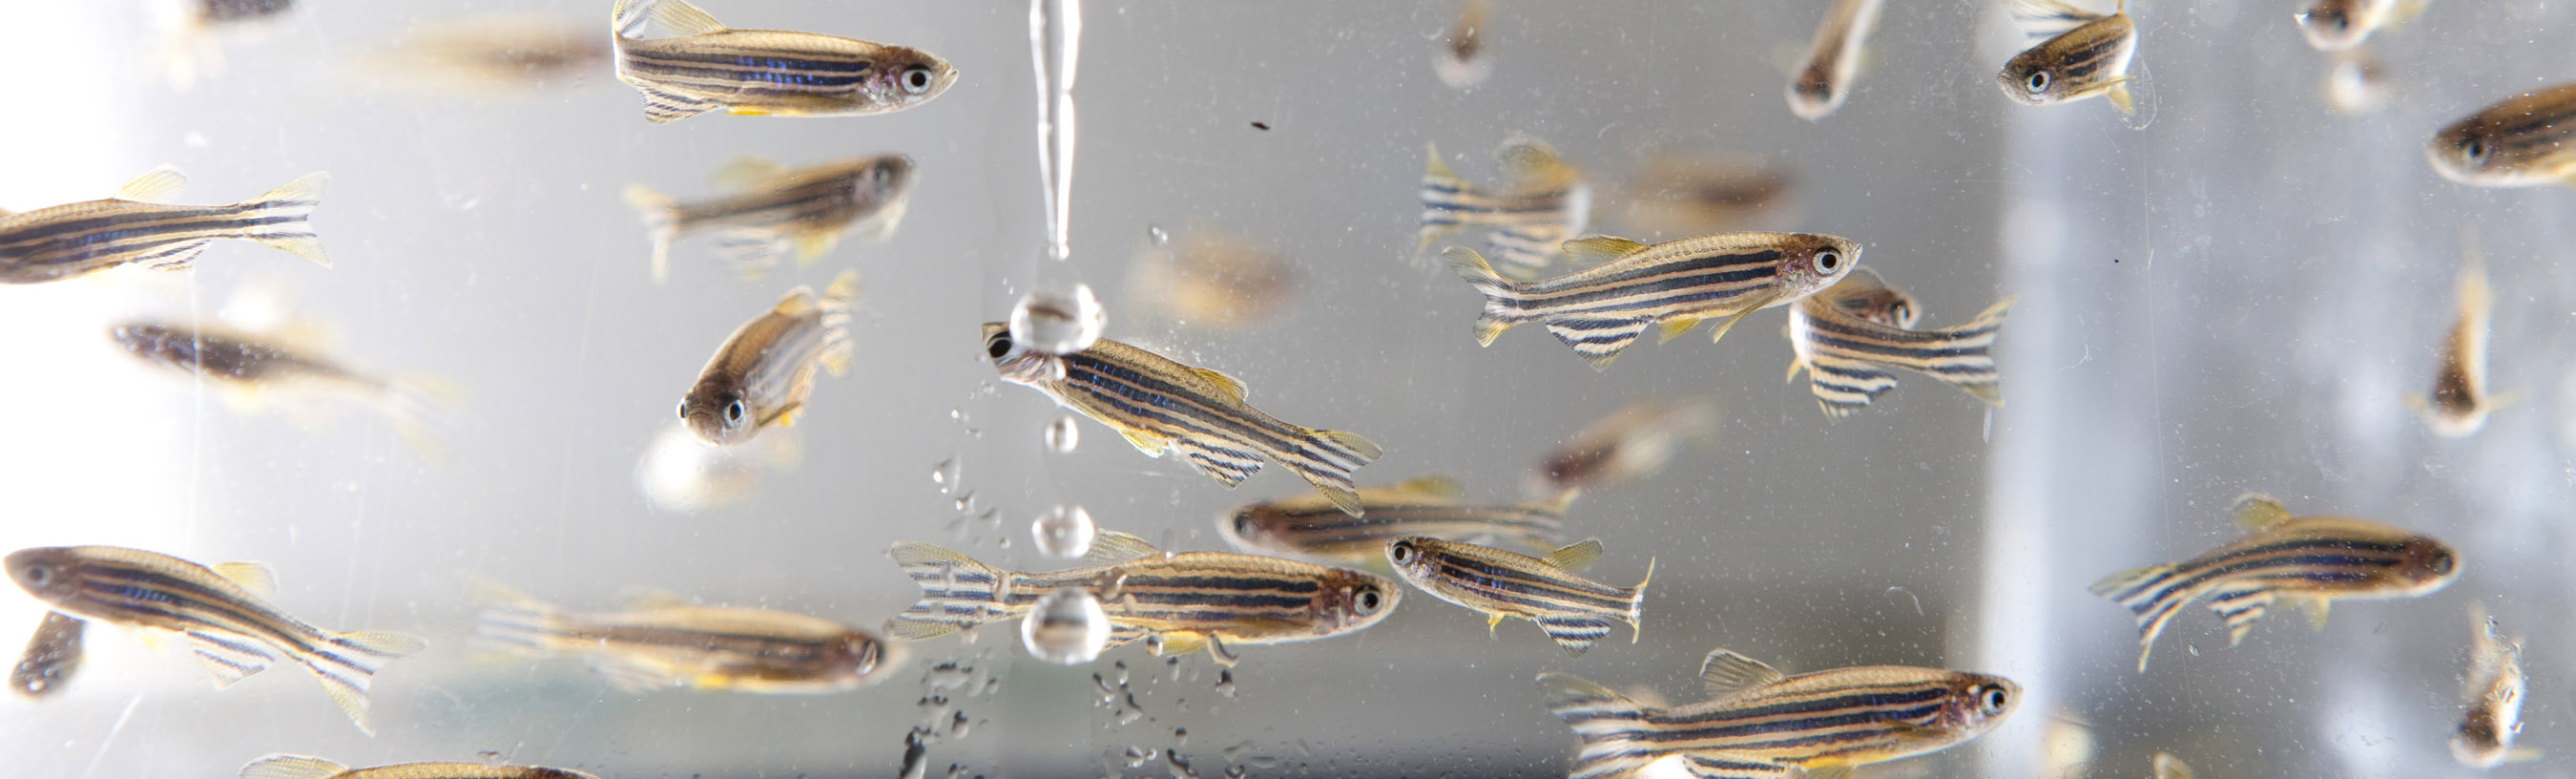 zebrafish_in_tank_crop, Zebrafish, Zebra fish, Zebrafish Core, ZAC, Zebrafish Aquacutlure Core, UNC Core Facility, UNC Core Facilities, Danio rerio